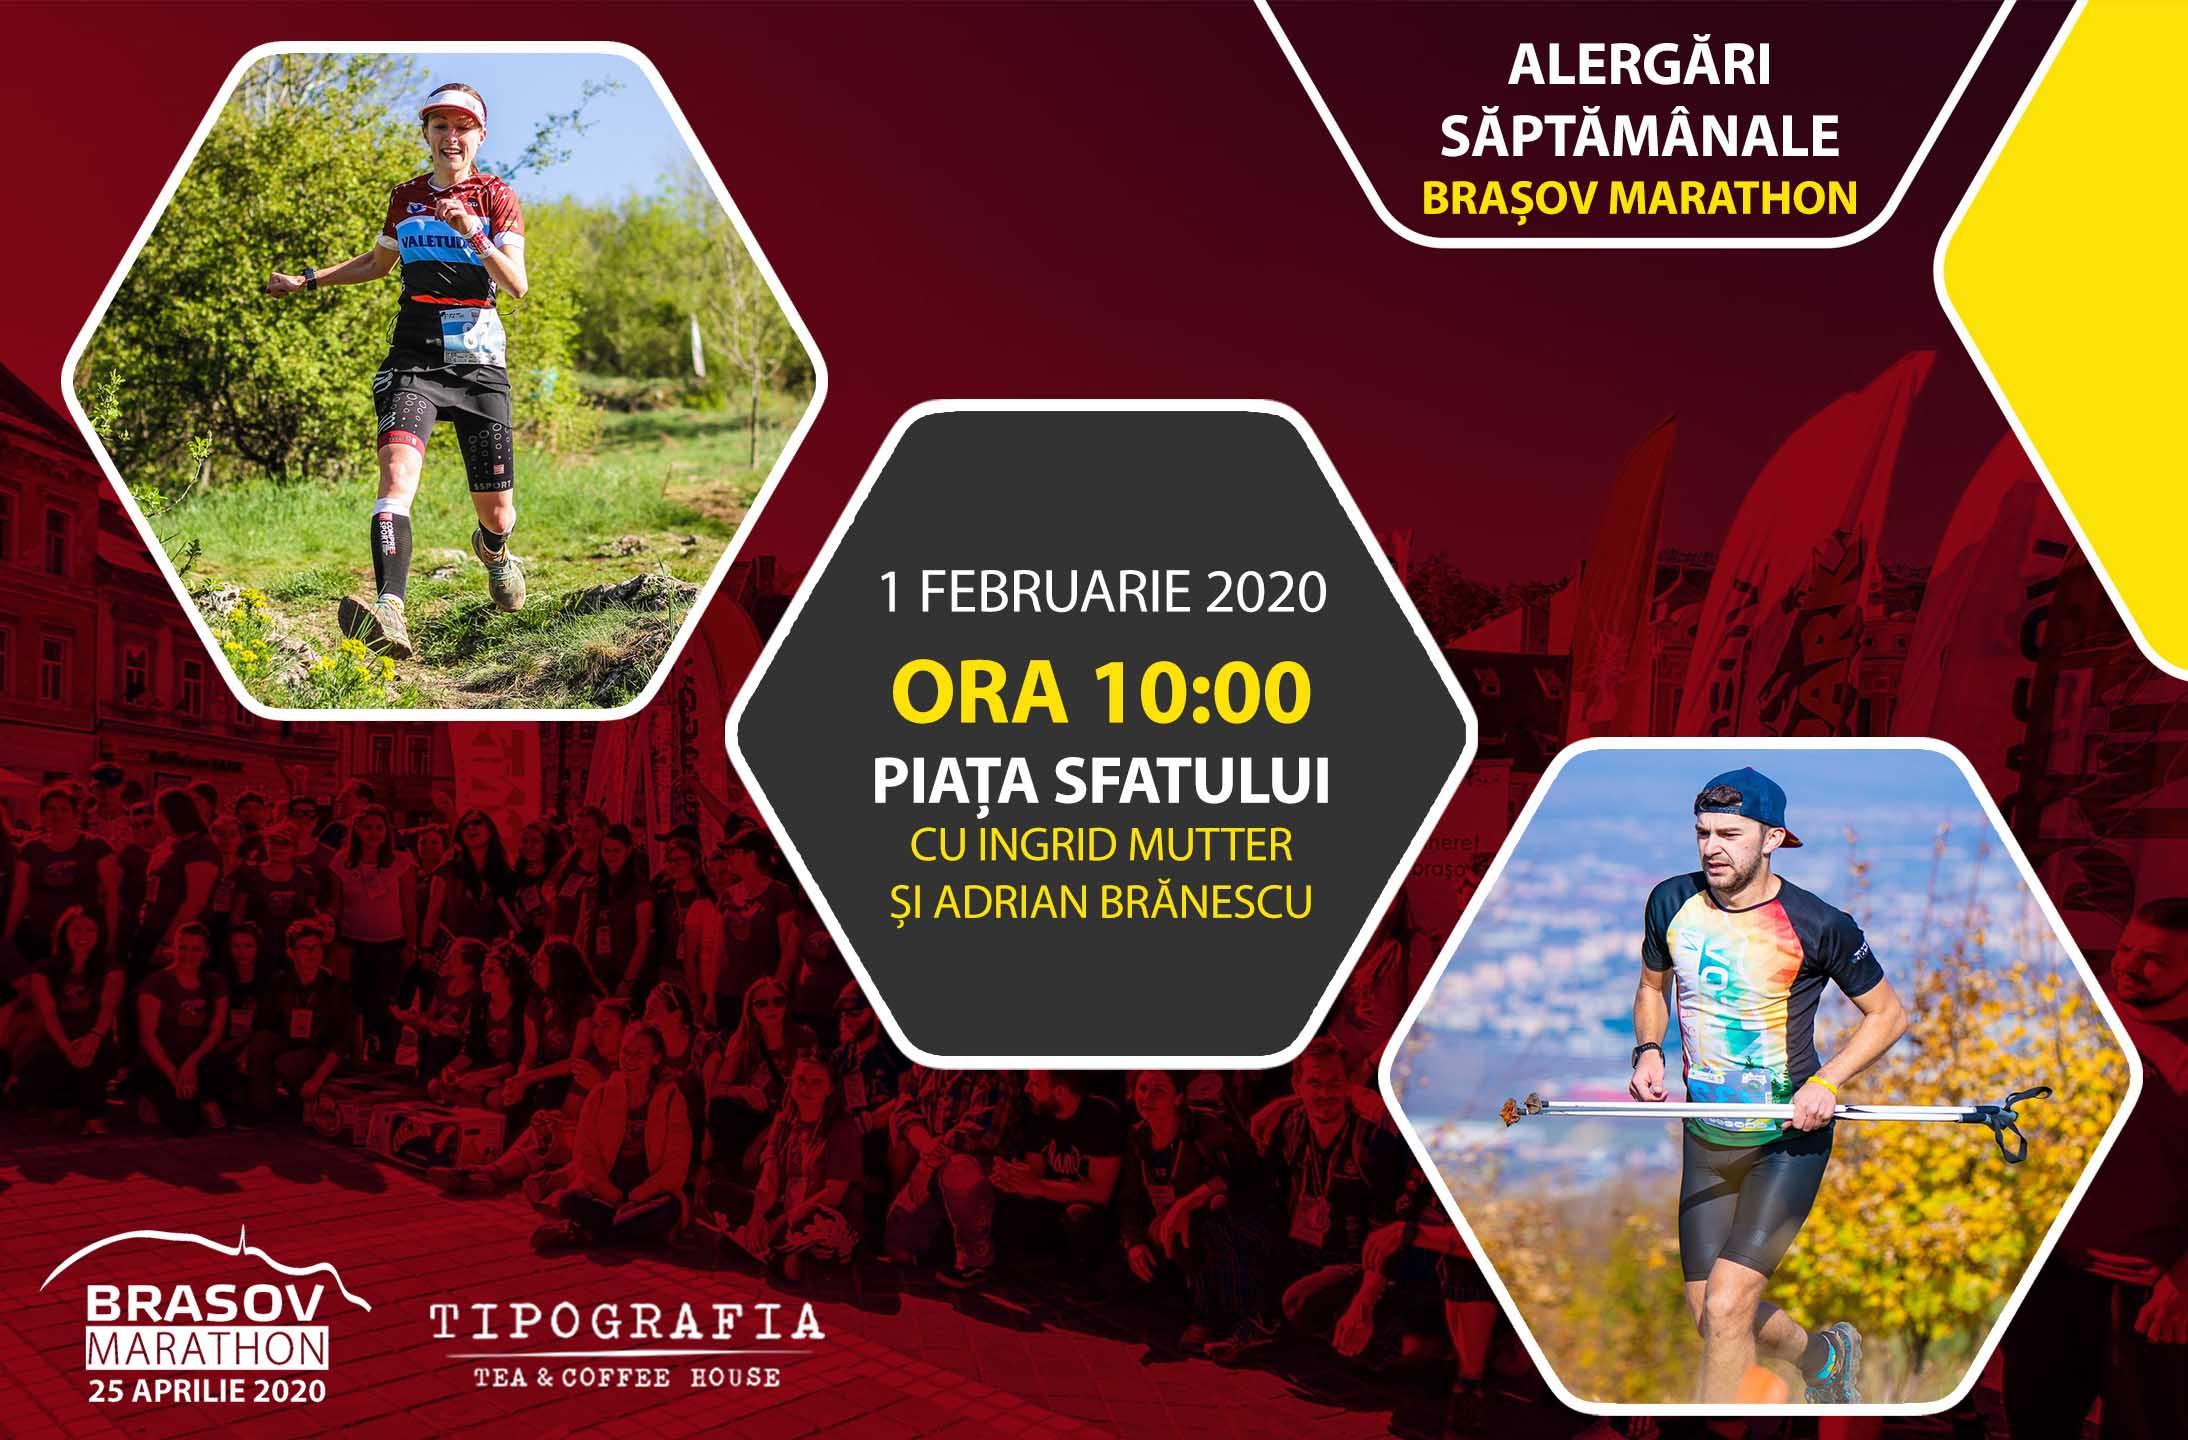 Brasov_marathon ALERGARE 1 FEBRUARIE 2020 redimensionata